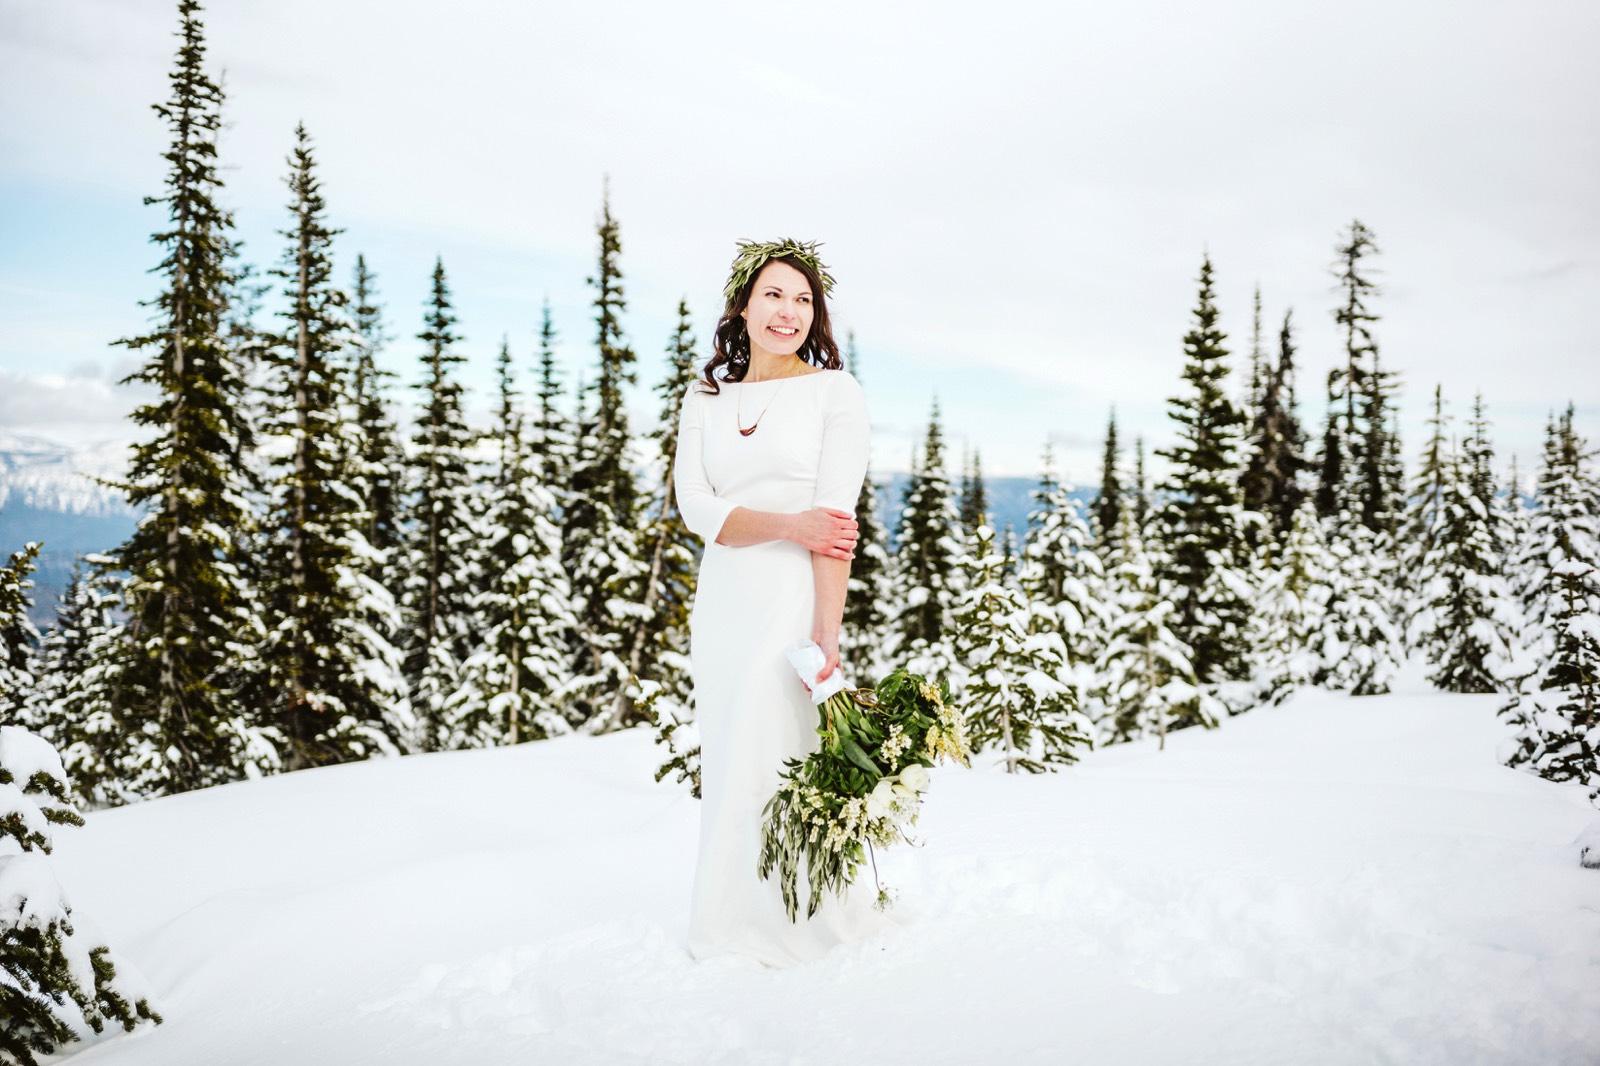 alpine-lakes-high-camp-winter-wedding-59 ALPINE LAKES HIGH CAMP WEDDING